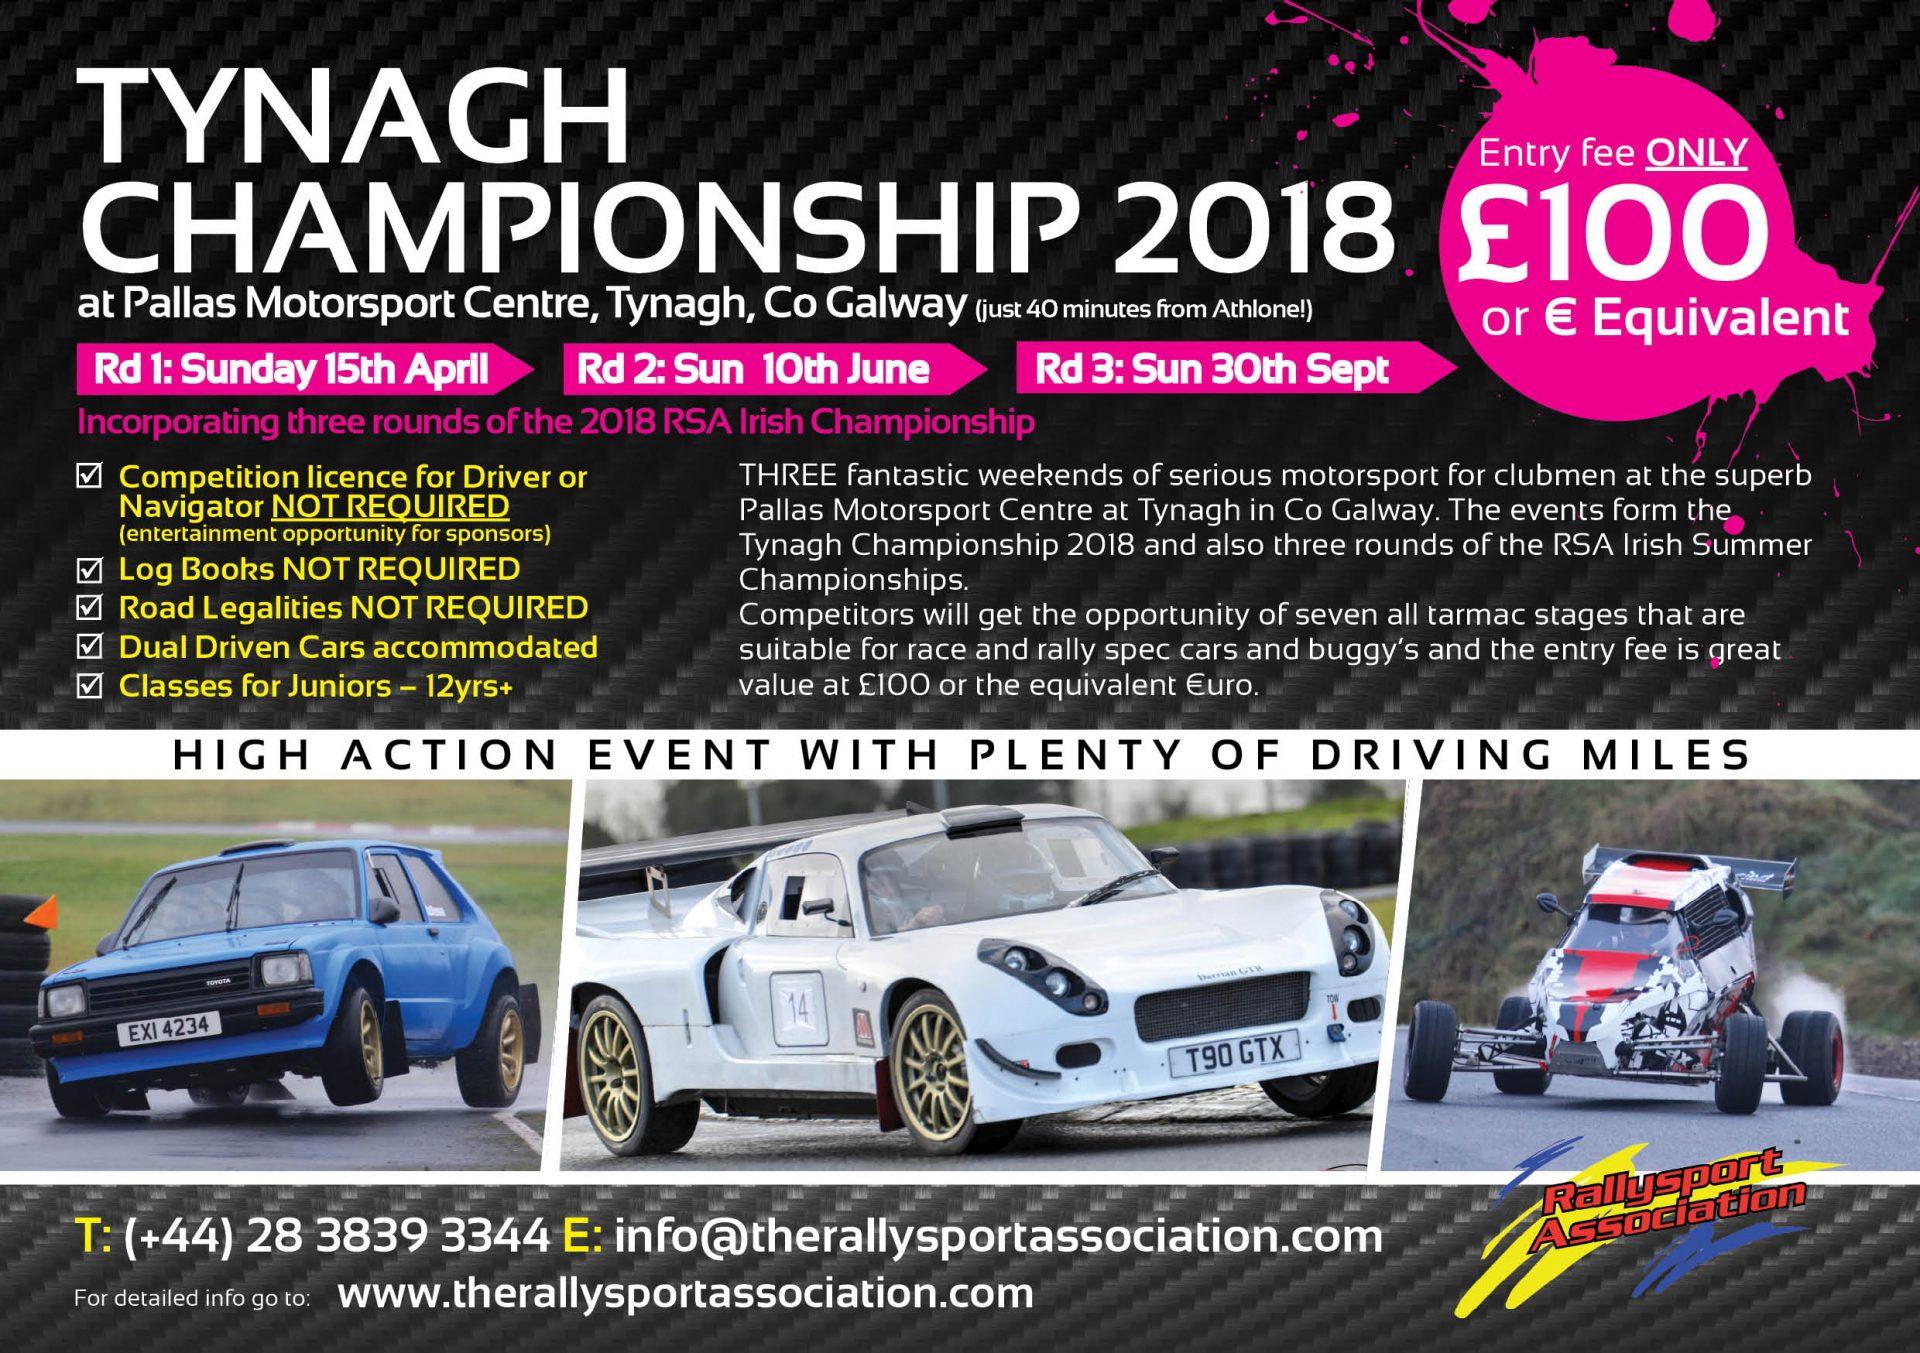 Rallysport Association RSA Tynagh Championship 2018